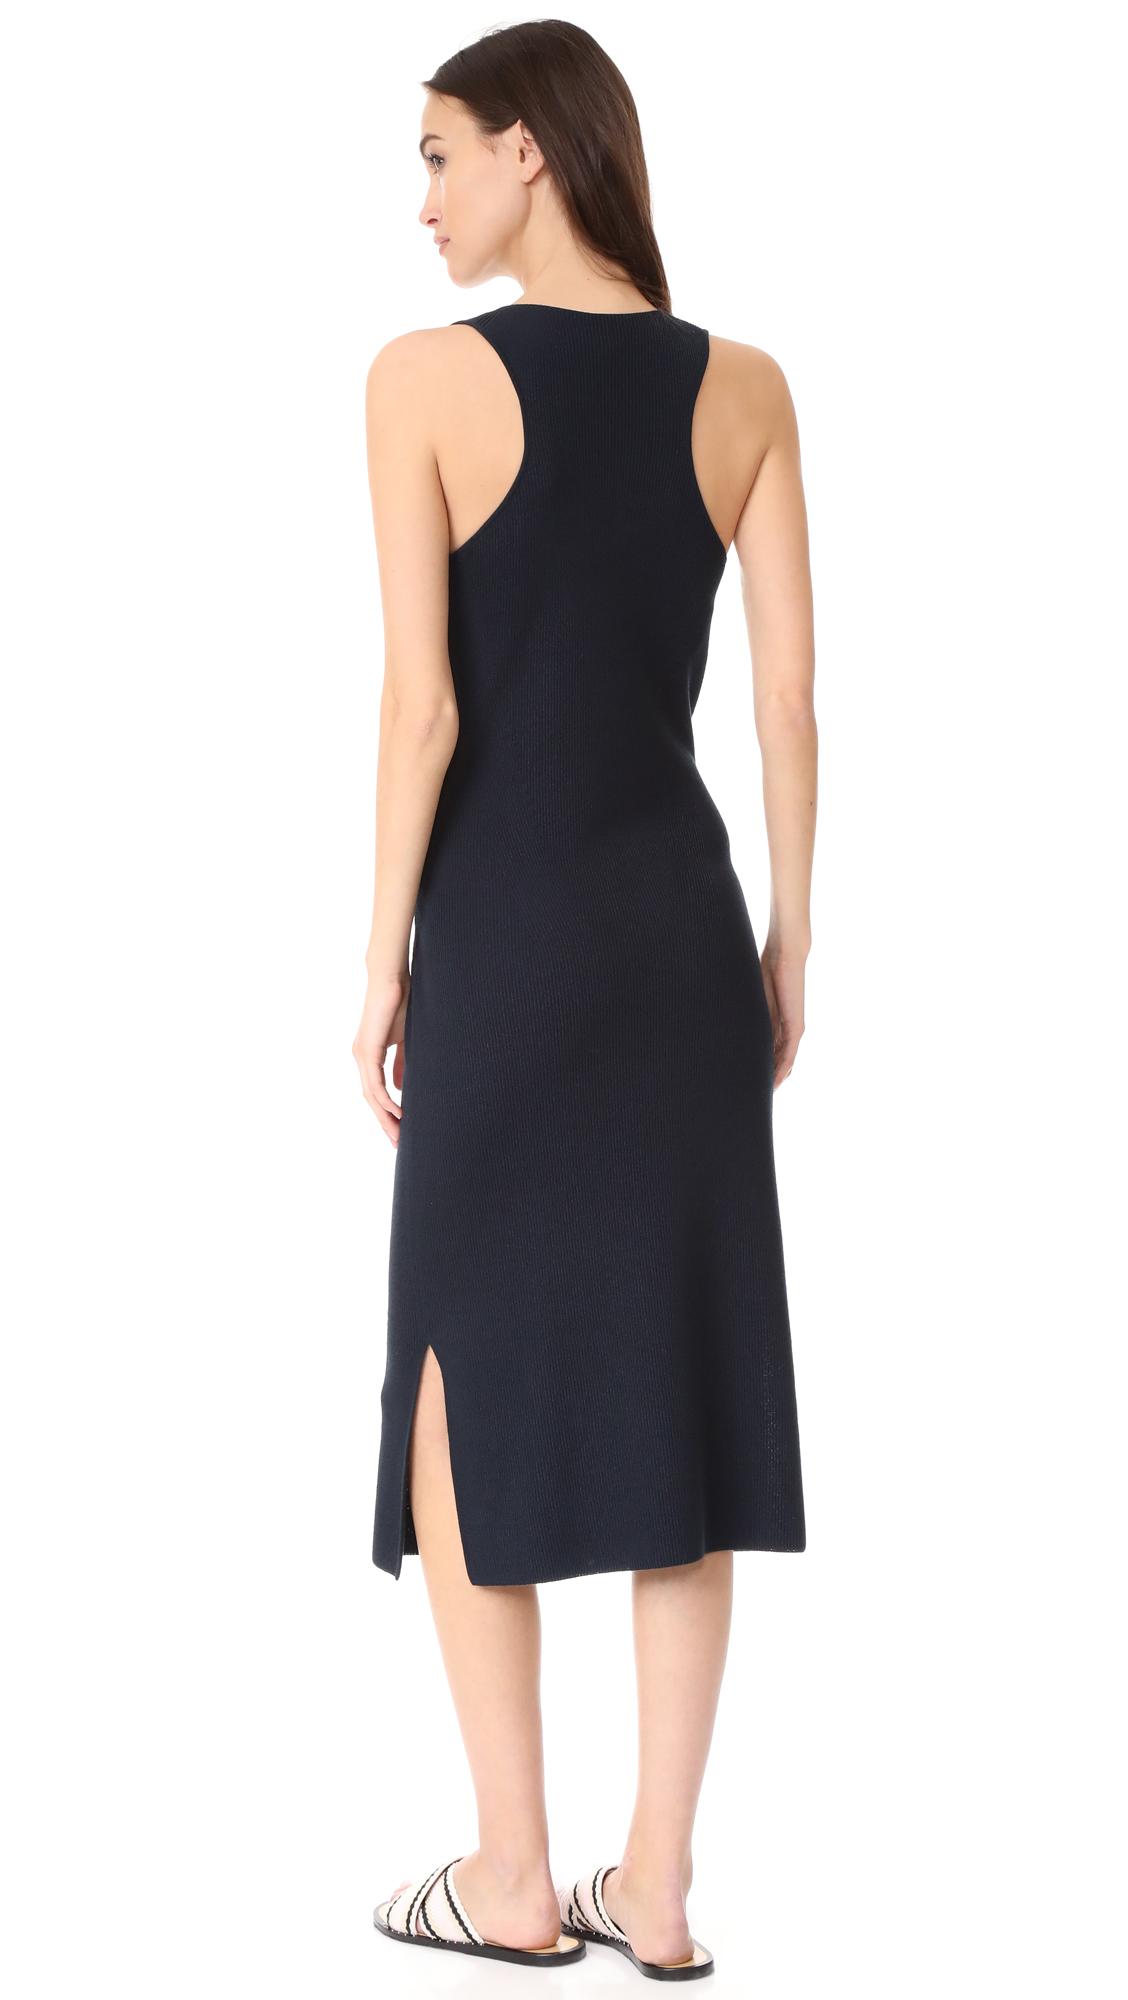 c2239a7f3c5 Rag   Bone Michelle Sweater Dress